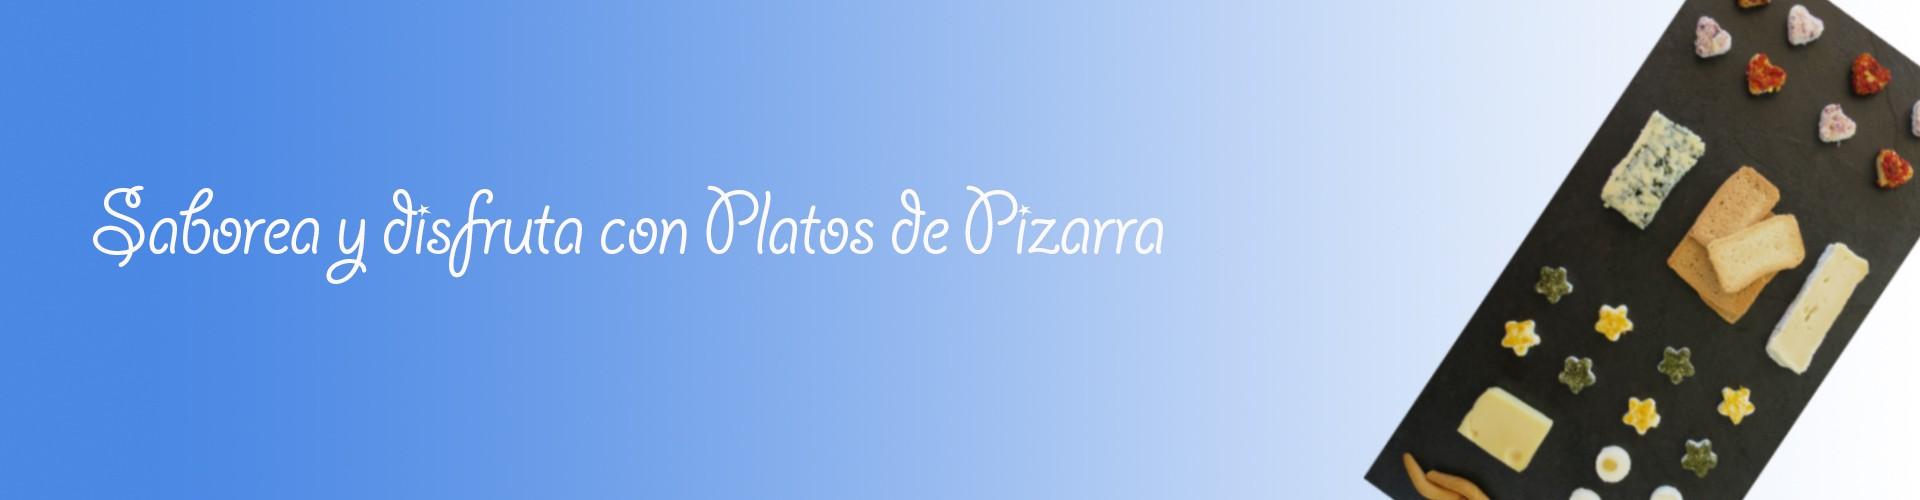 Platos de Pizarra